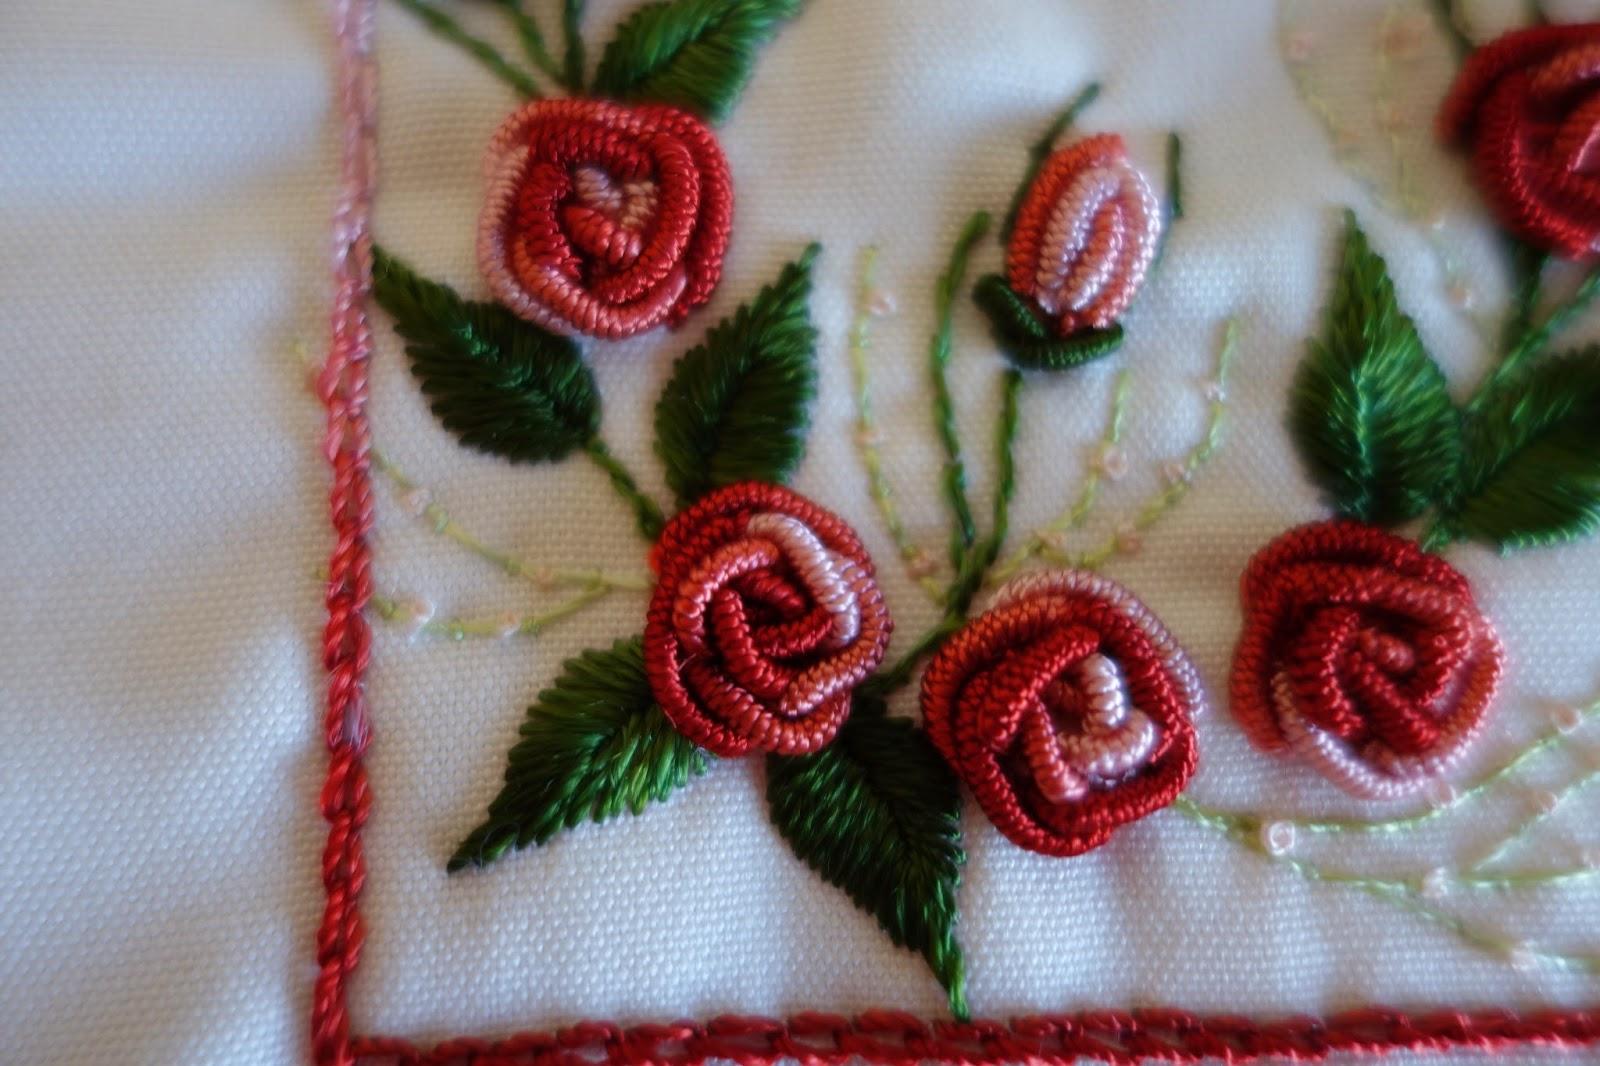 Sew Fun 2 Quilt Brazilian Embroidery